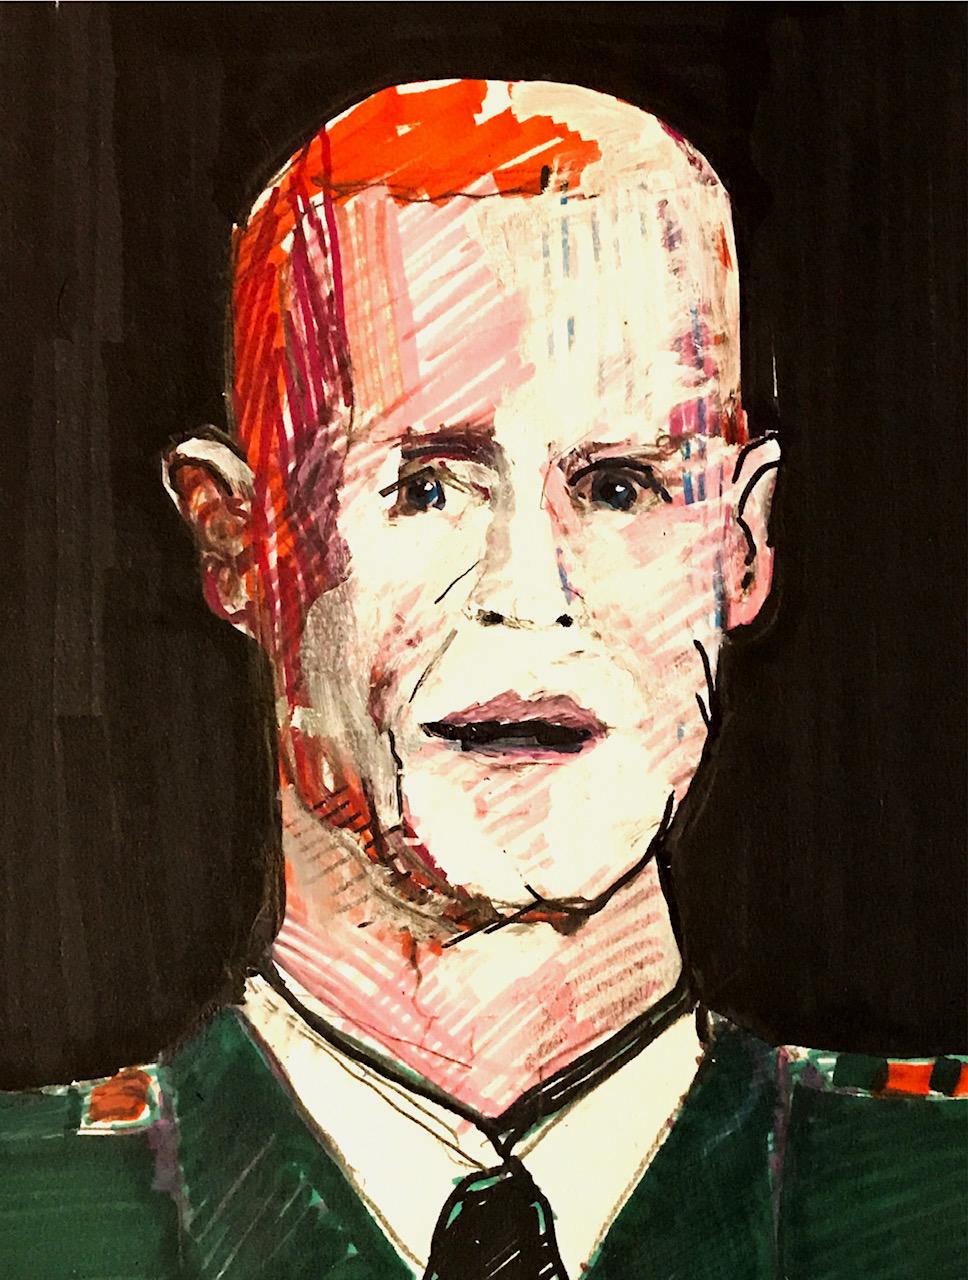 McChrystal calls it like it is